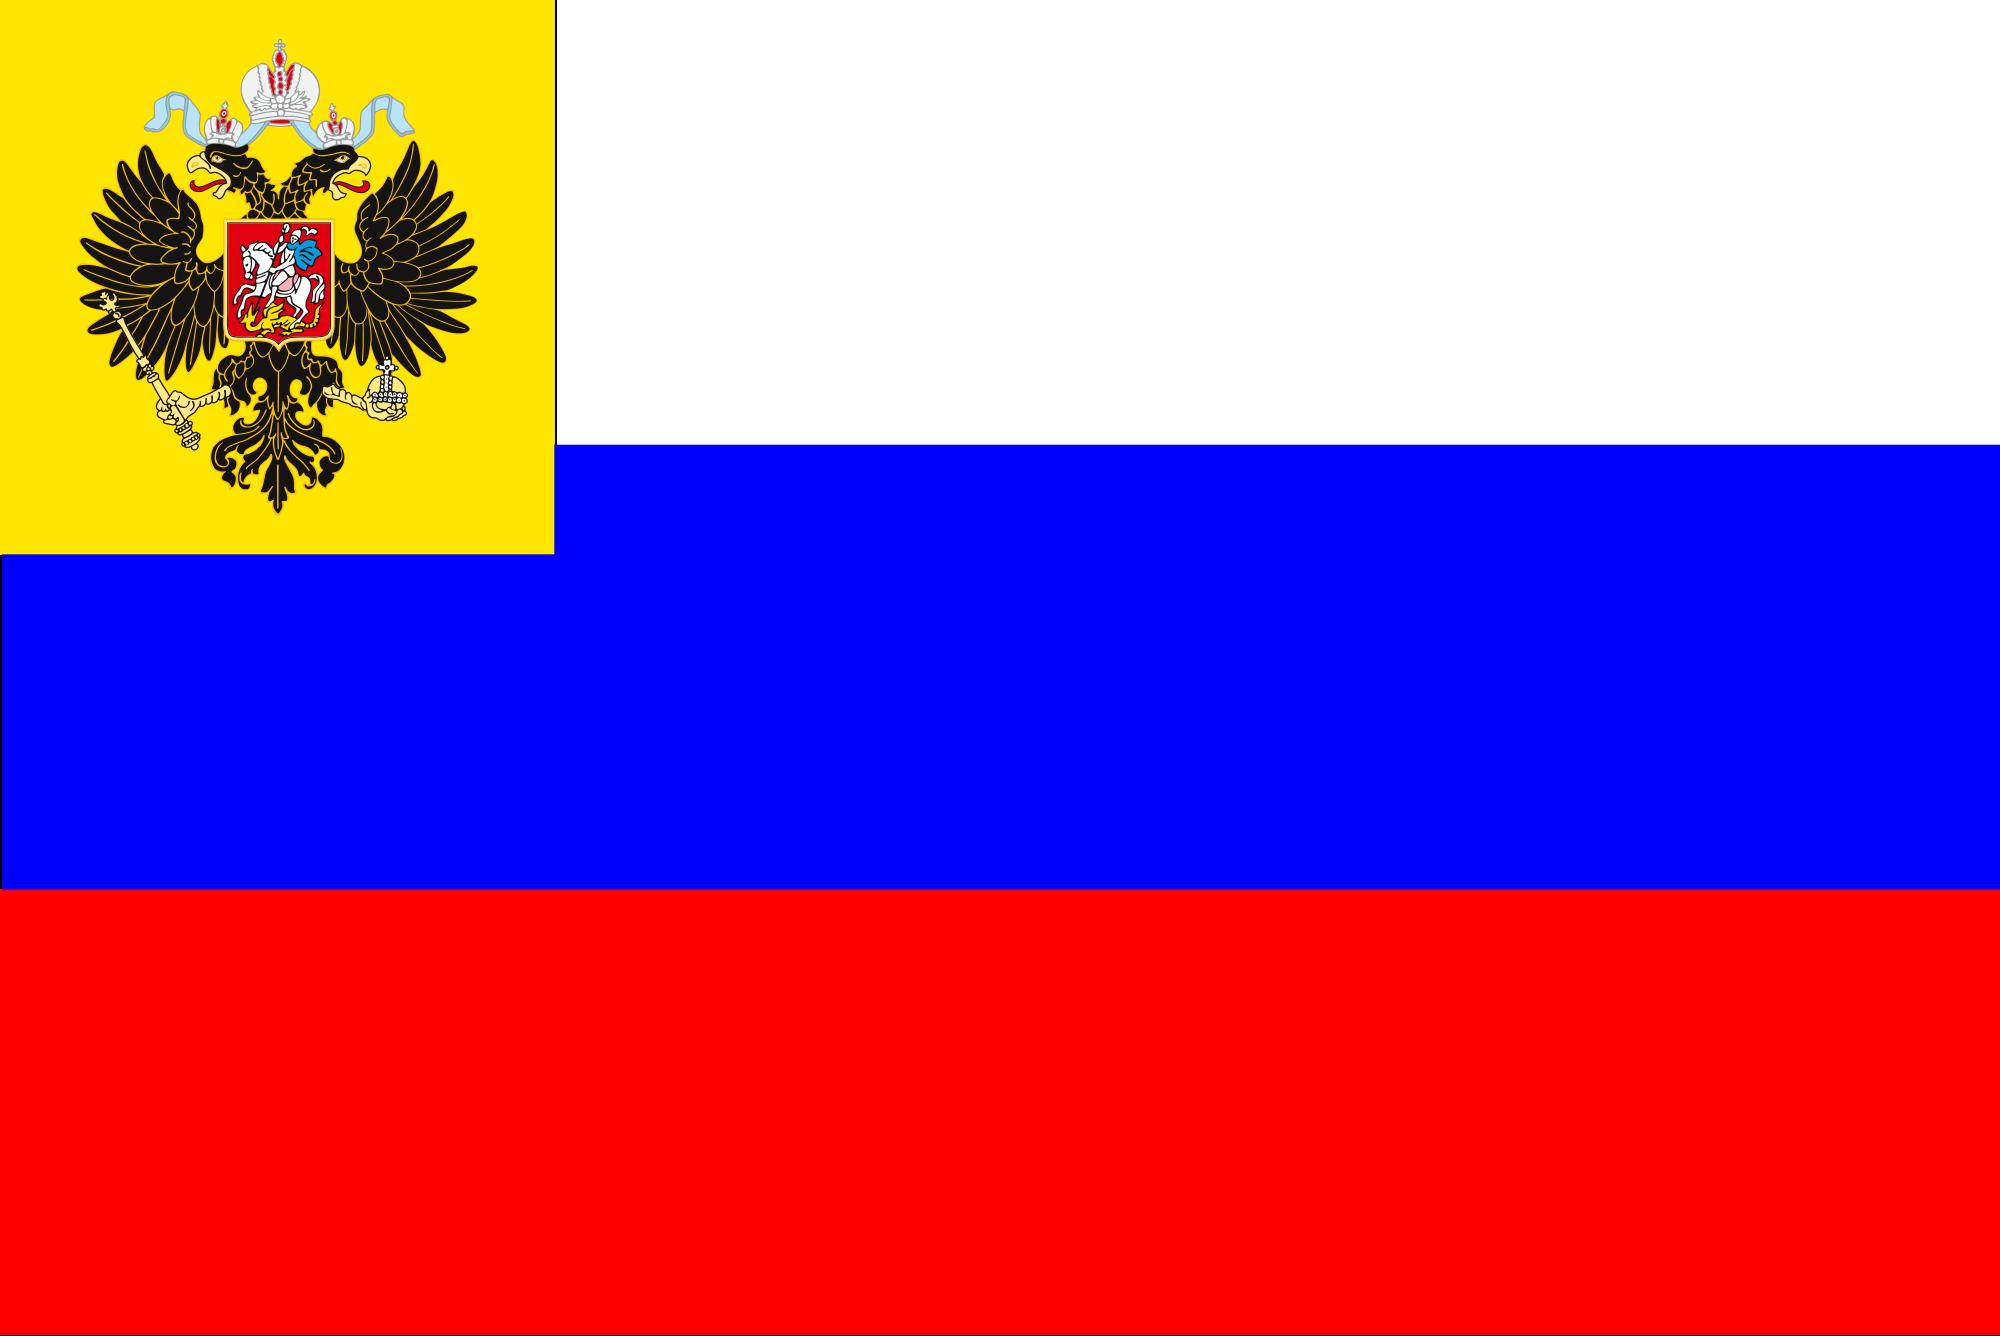 Imagen - Bandera Imperio Ruso (1914-17).png | Historia Alternativa ...